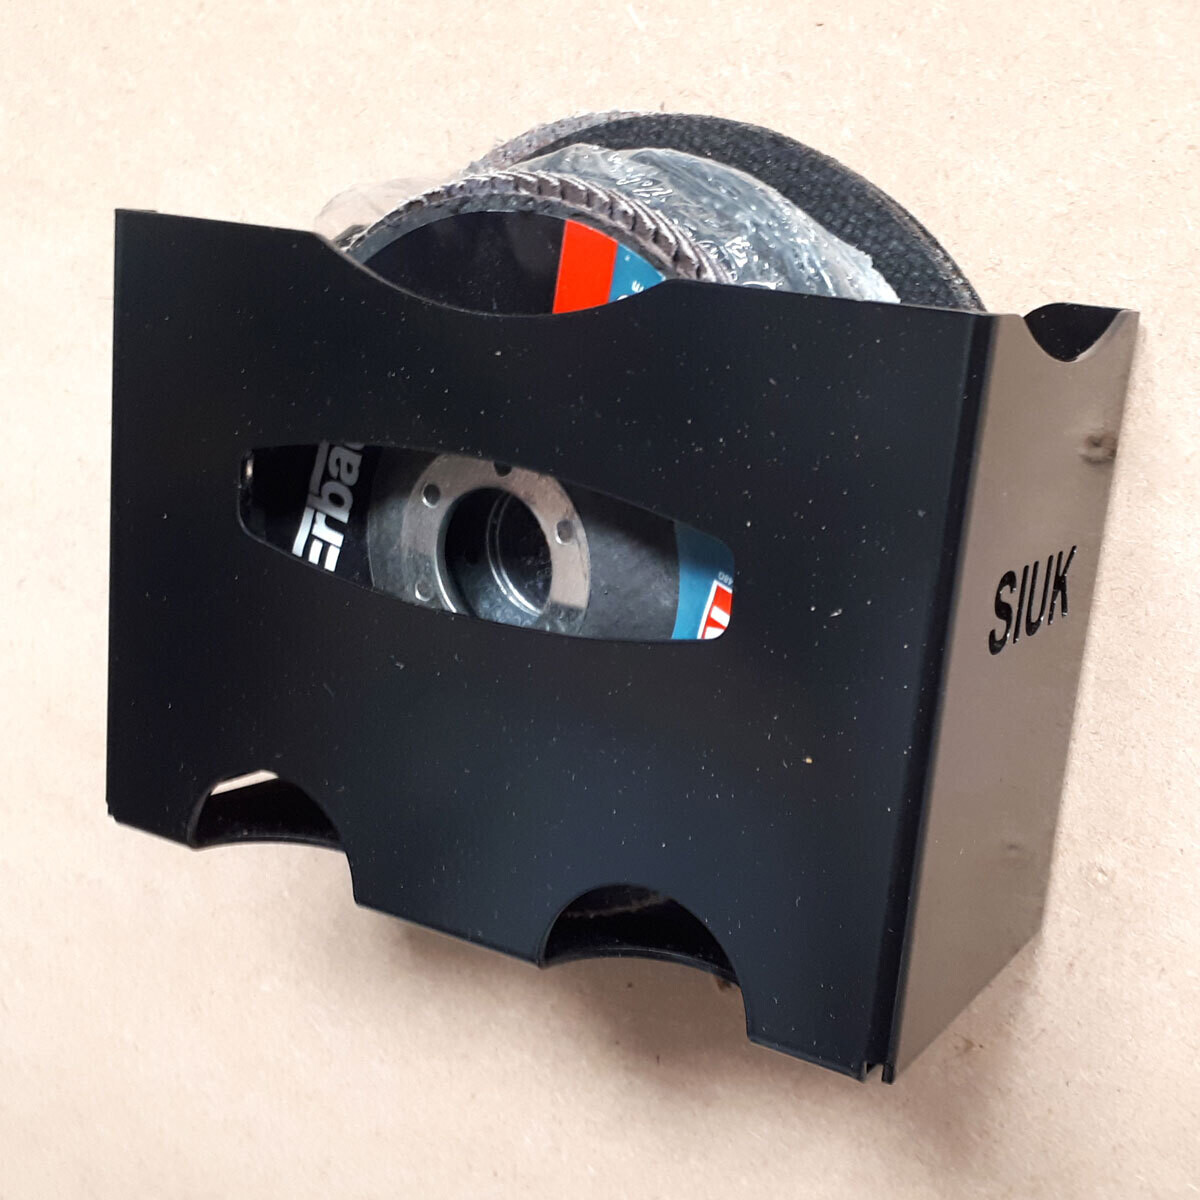 Grinding Disc Abrasive Wheel Holder Wall Mount